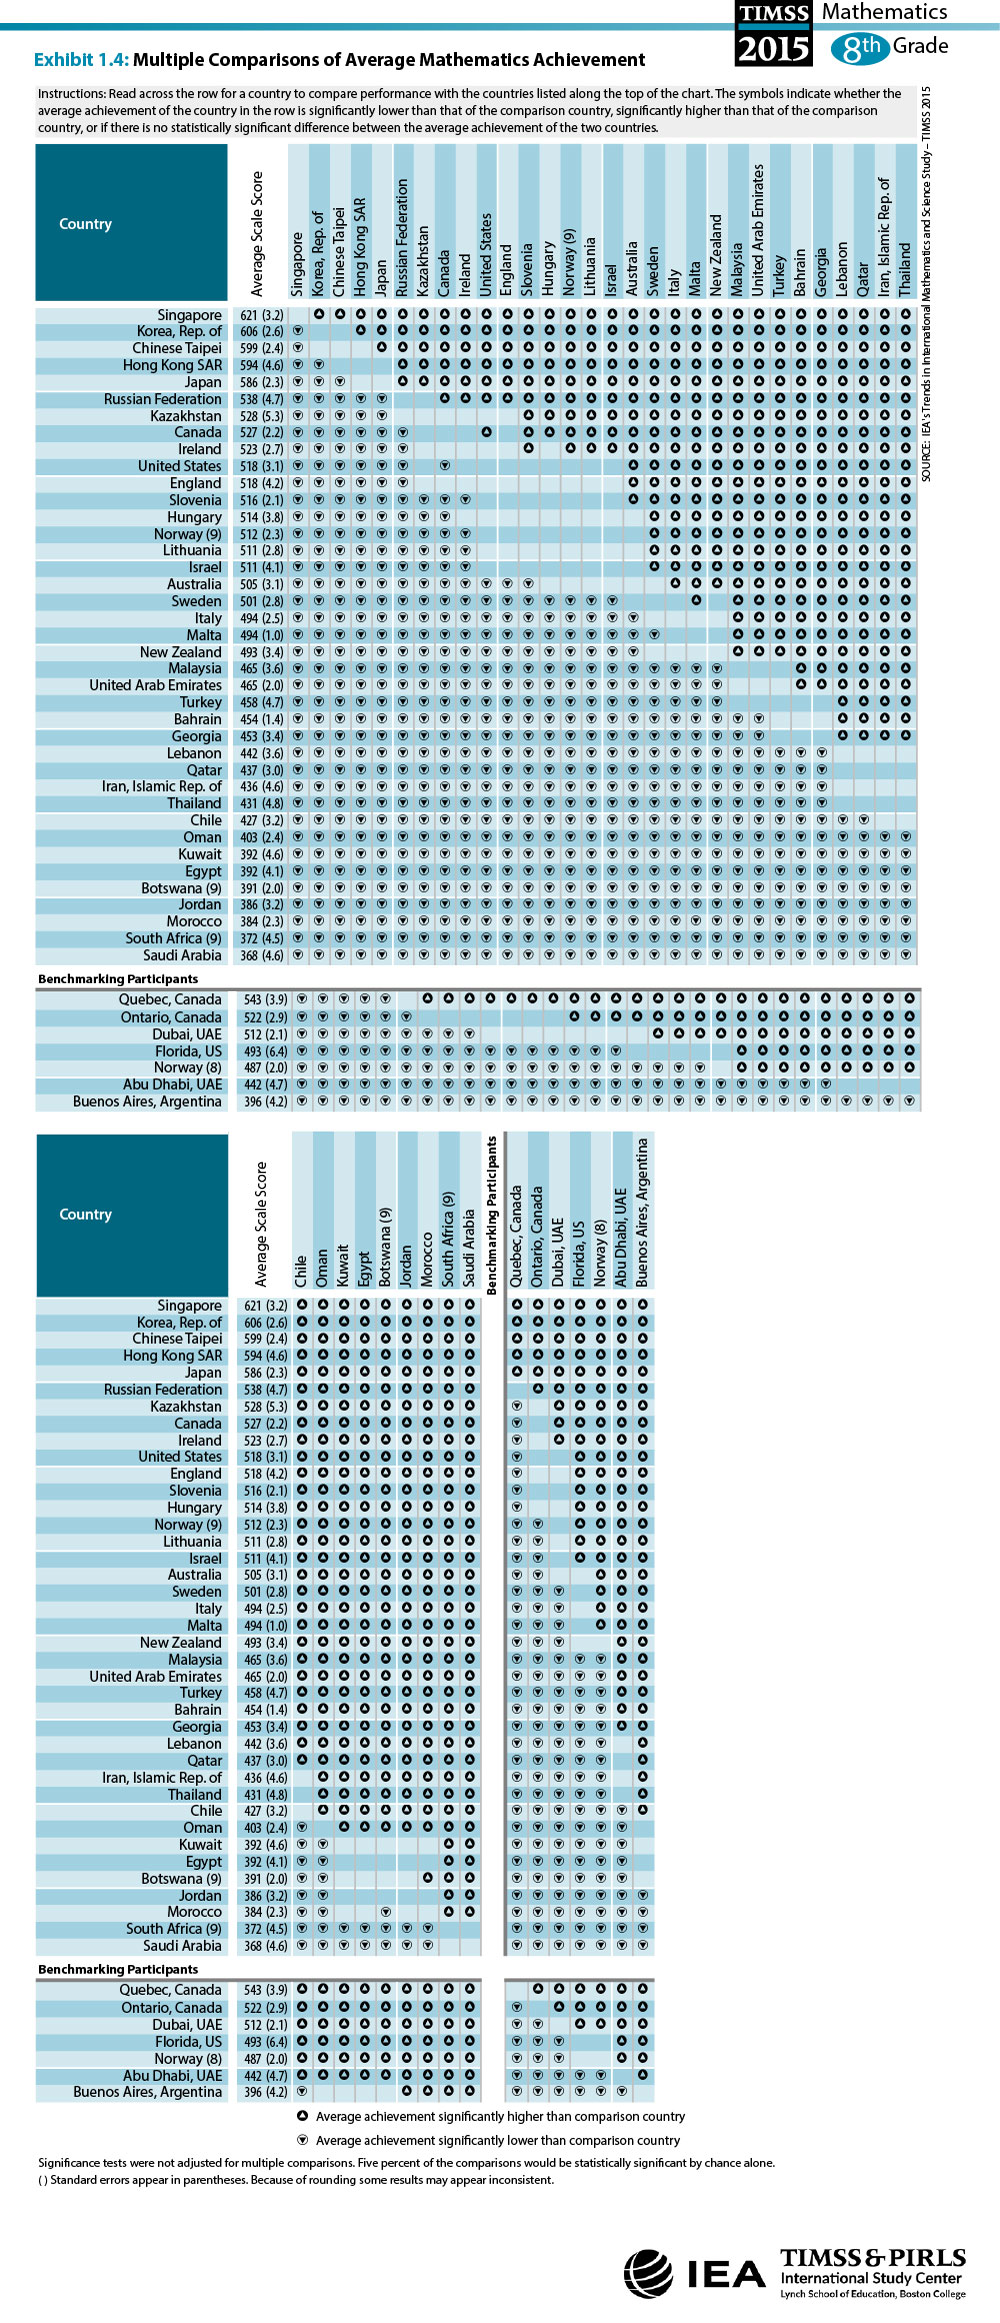 Multiple Comparisons of Average Mathematics Achievement